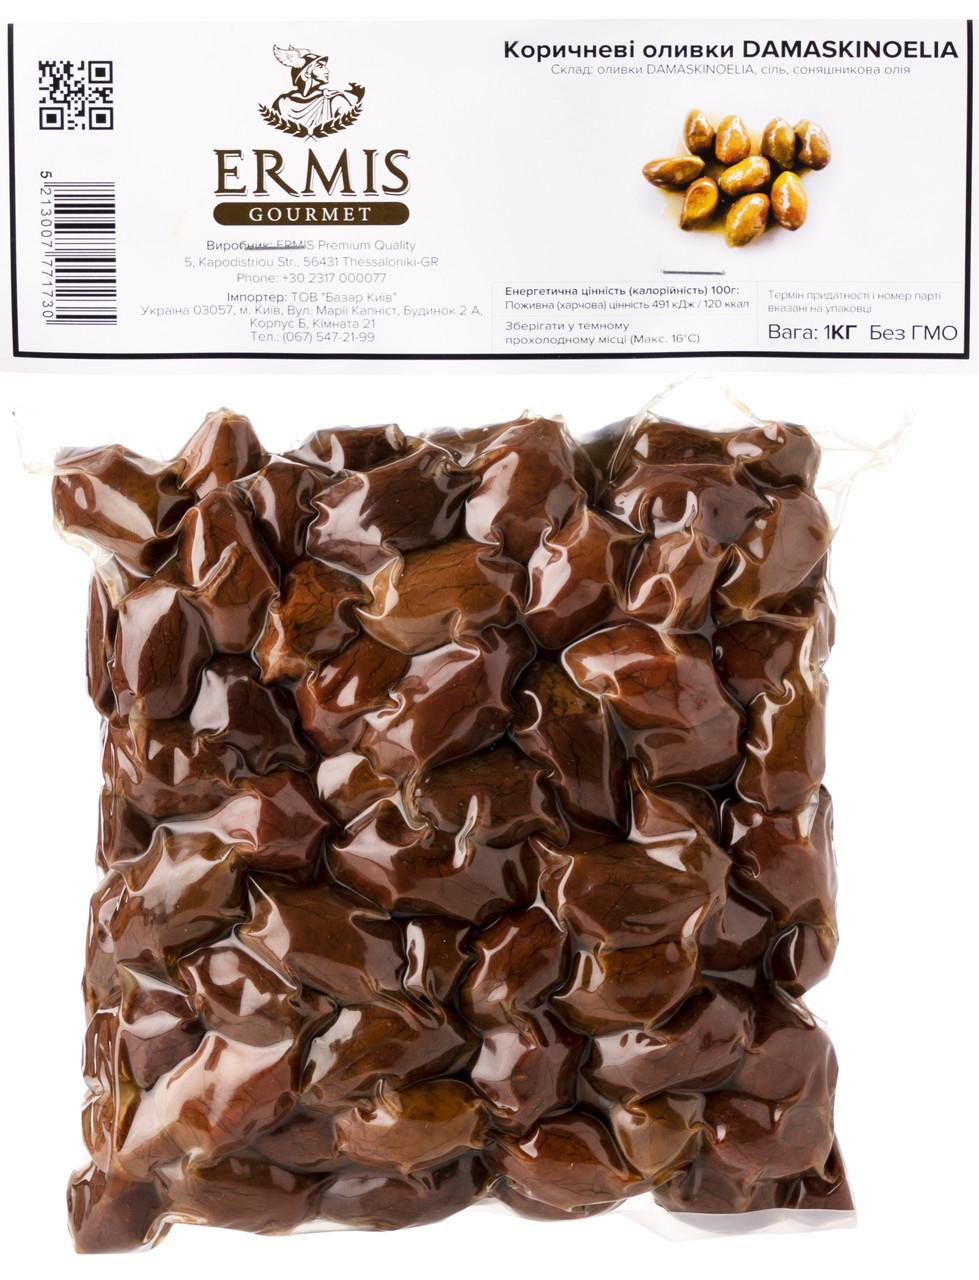 Оливки вяленые DAMASKINOELIA, 500 грамм